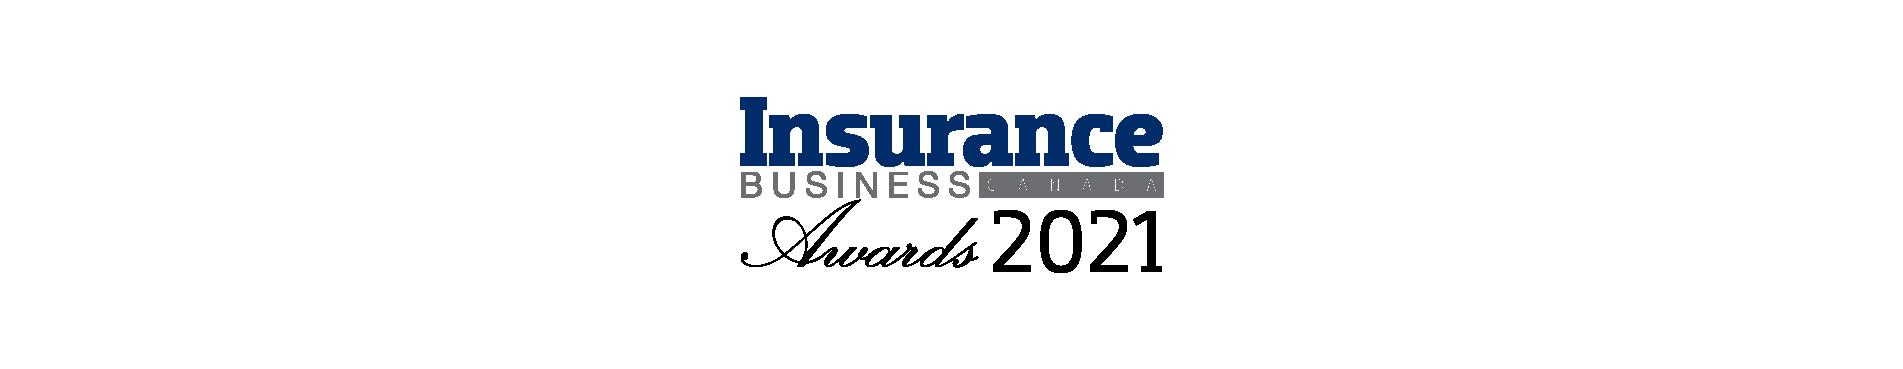 Insurance Business Canada Awards